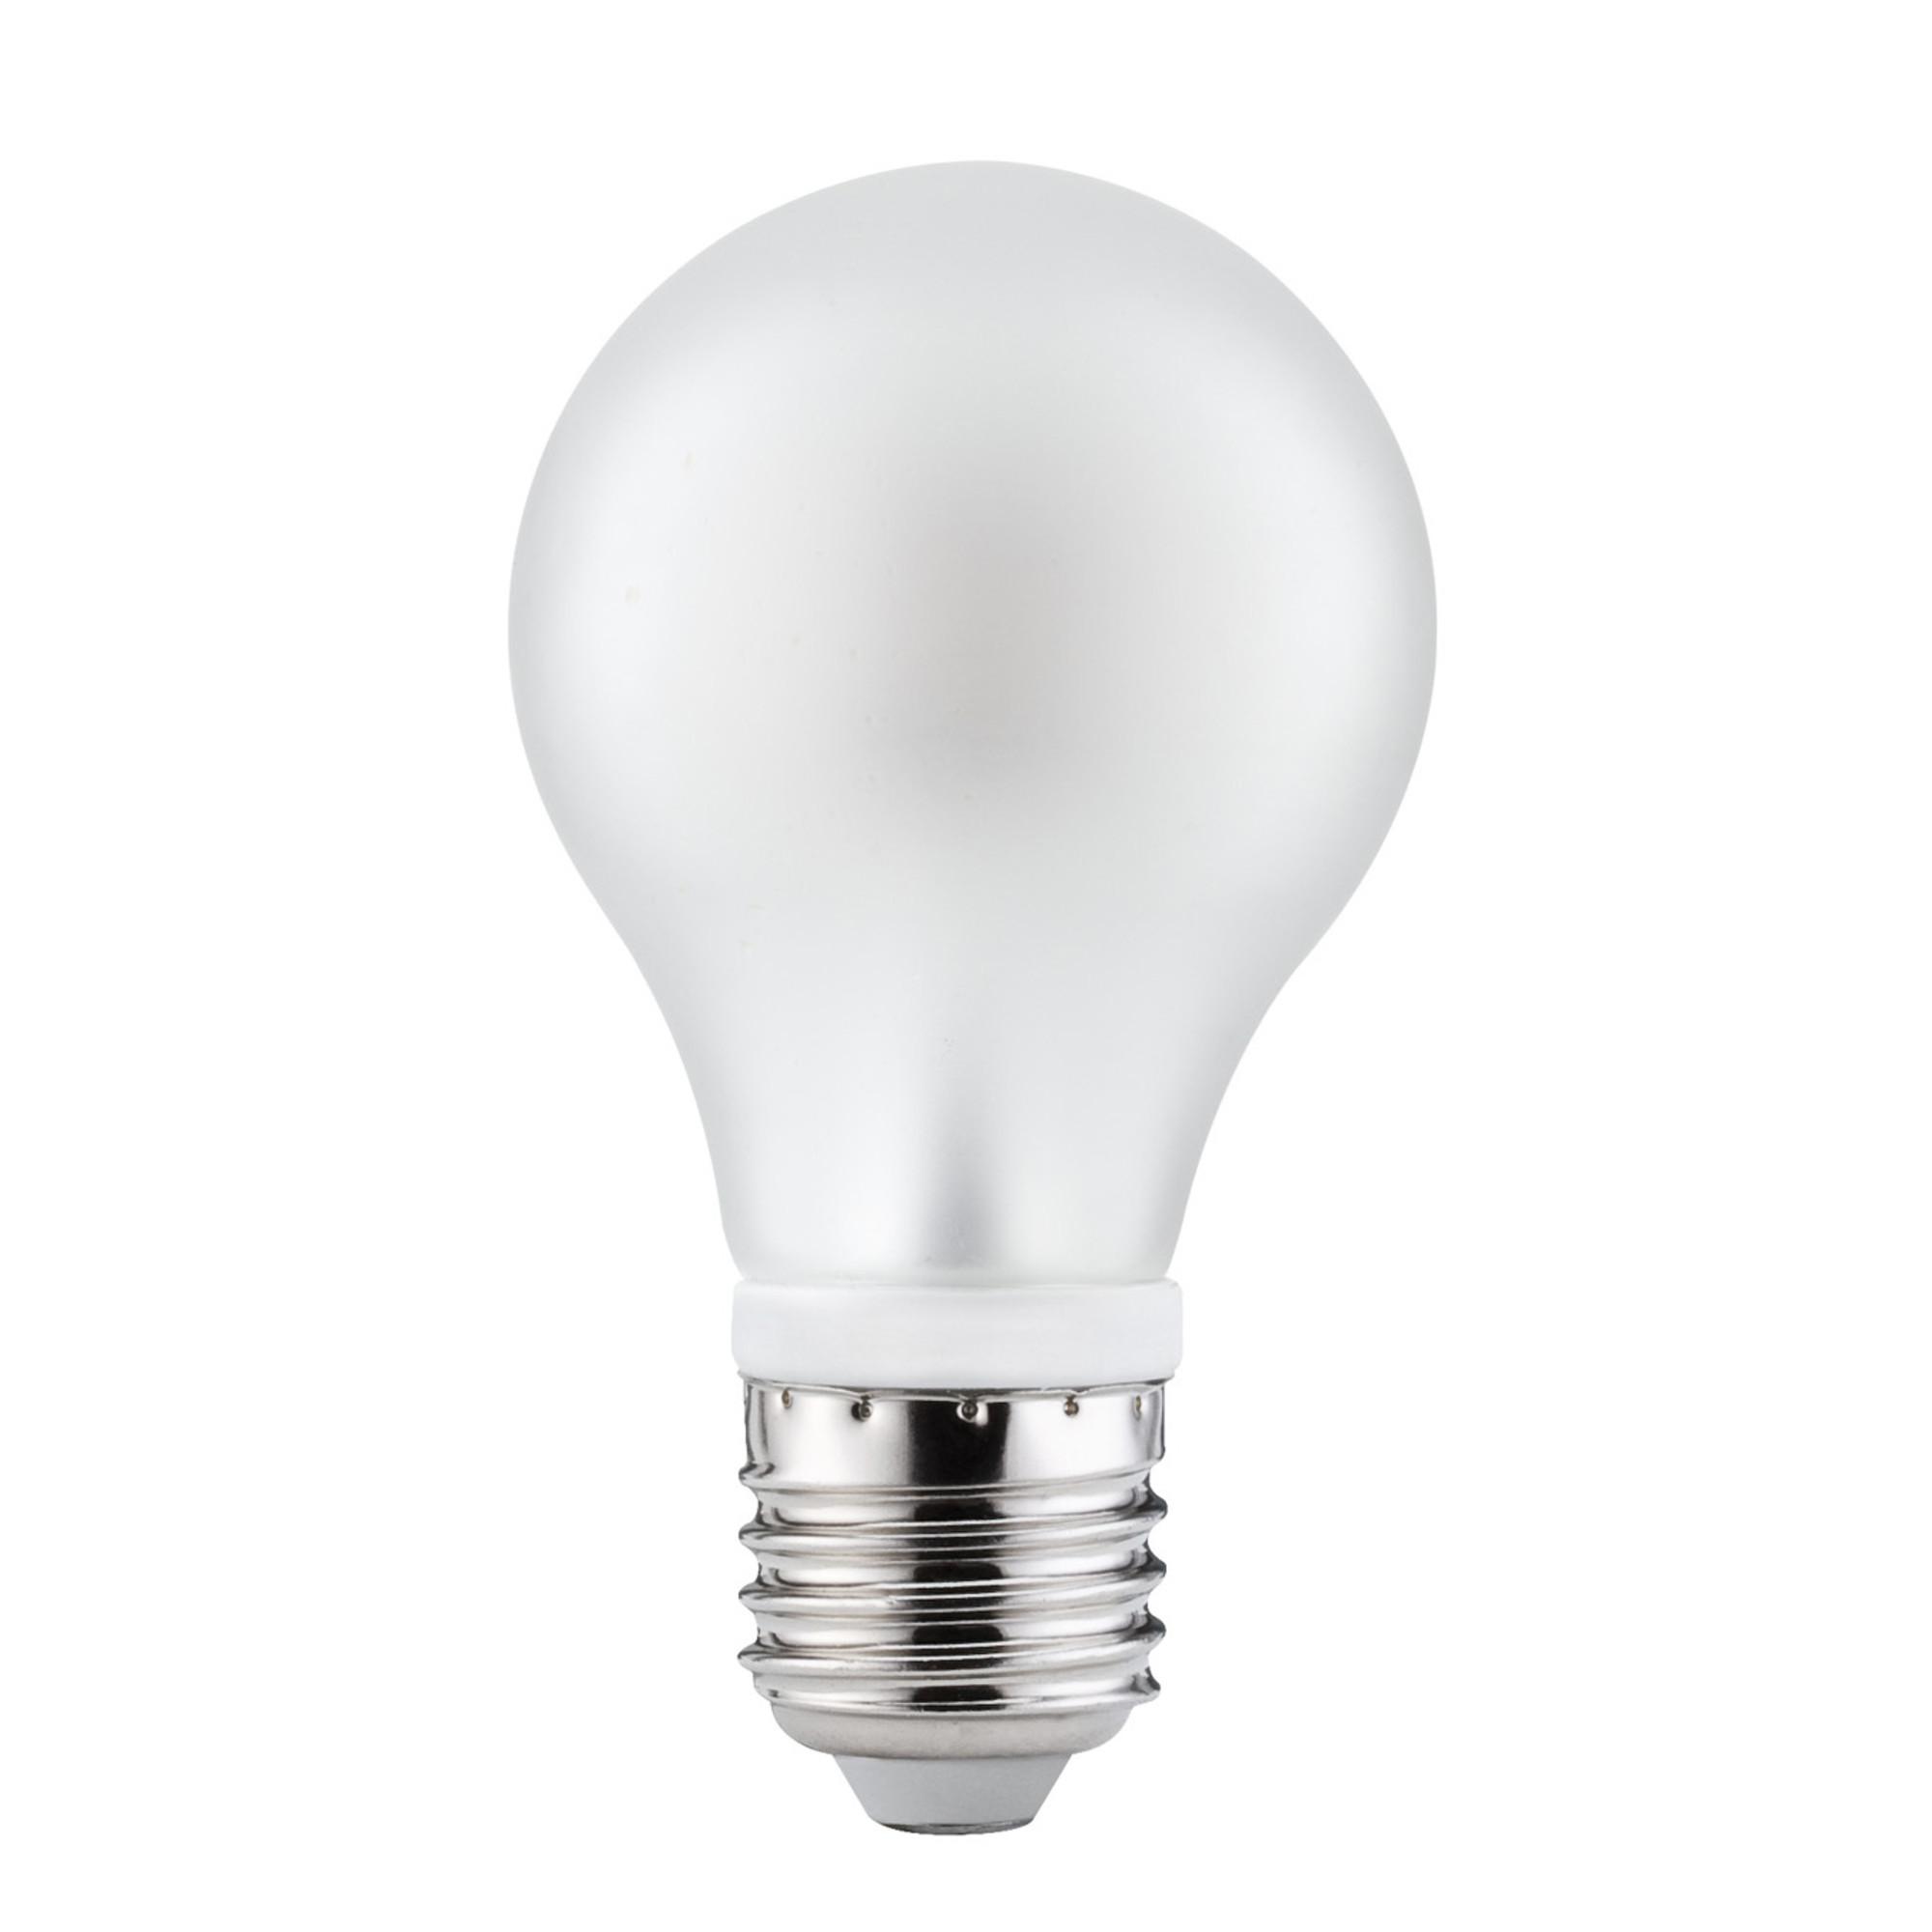 Лампа светодиодная Paulmann 28278 E27 470 Лм теплый свет